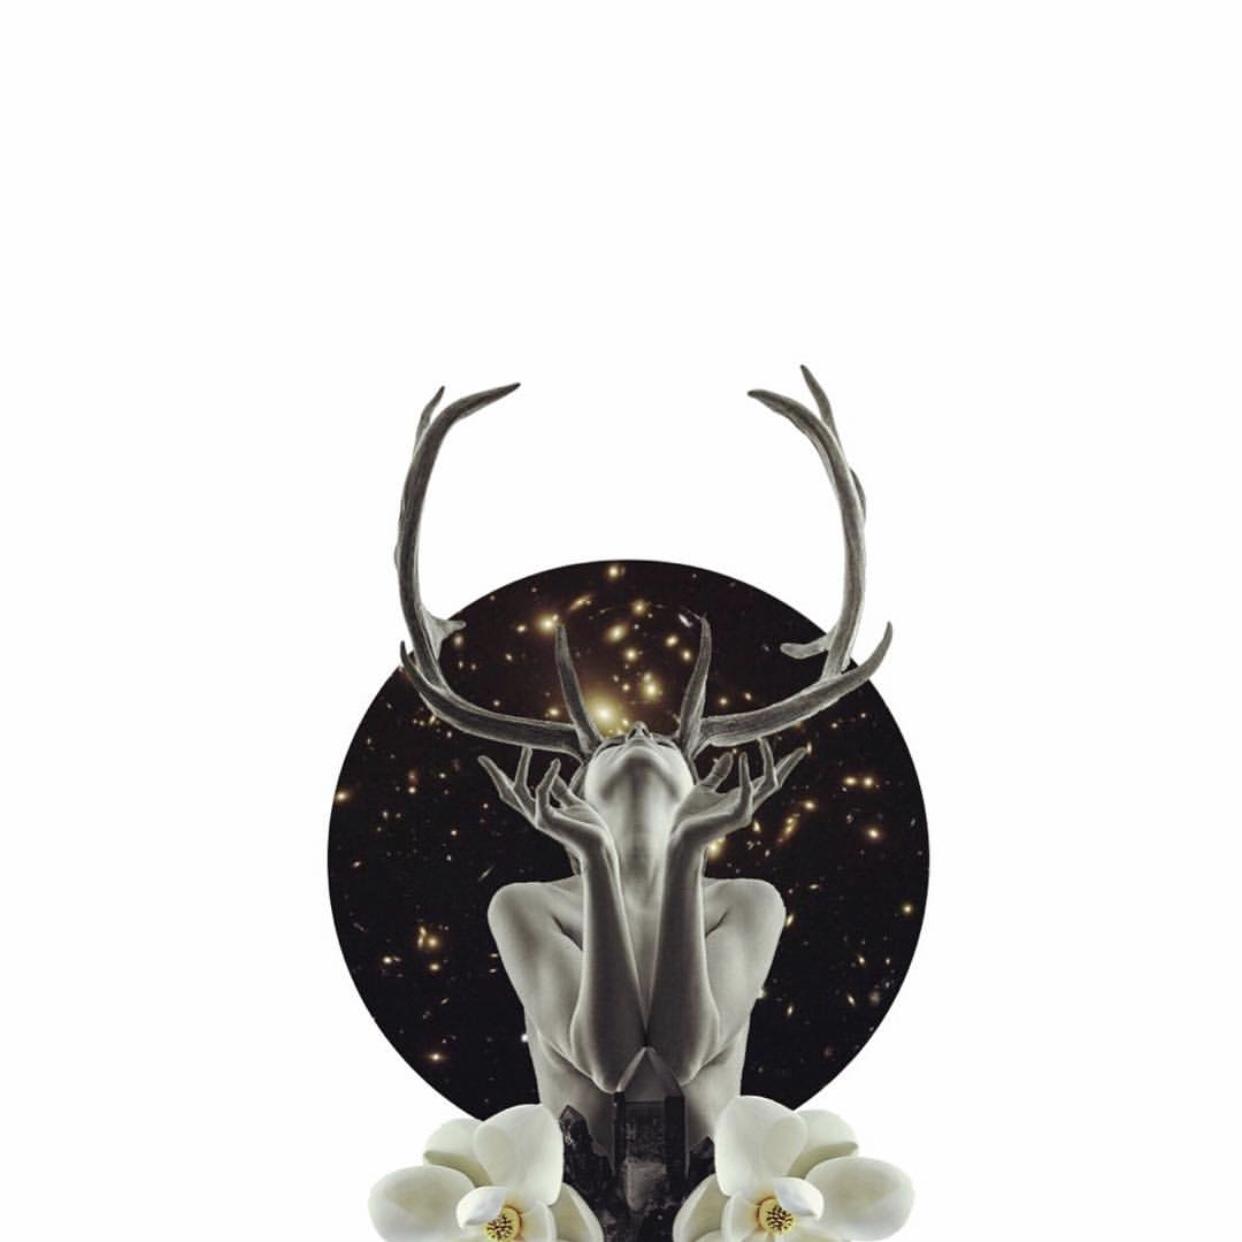 Art by  Brandi Van Nevel